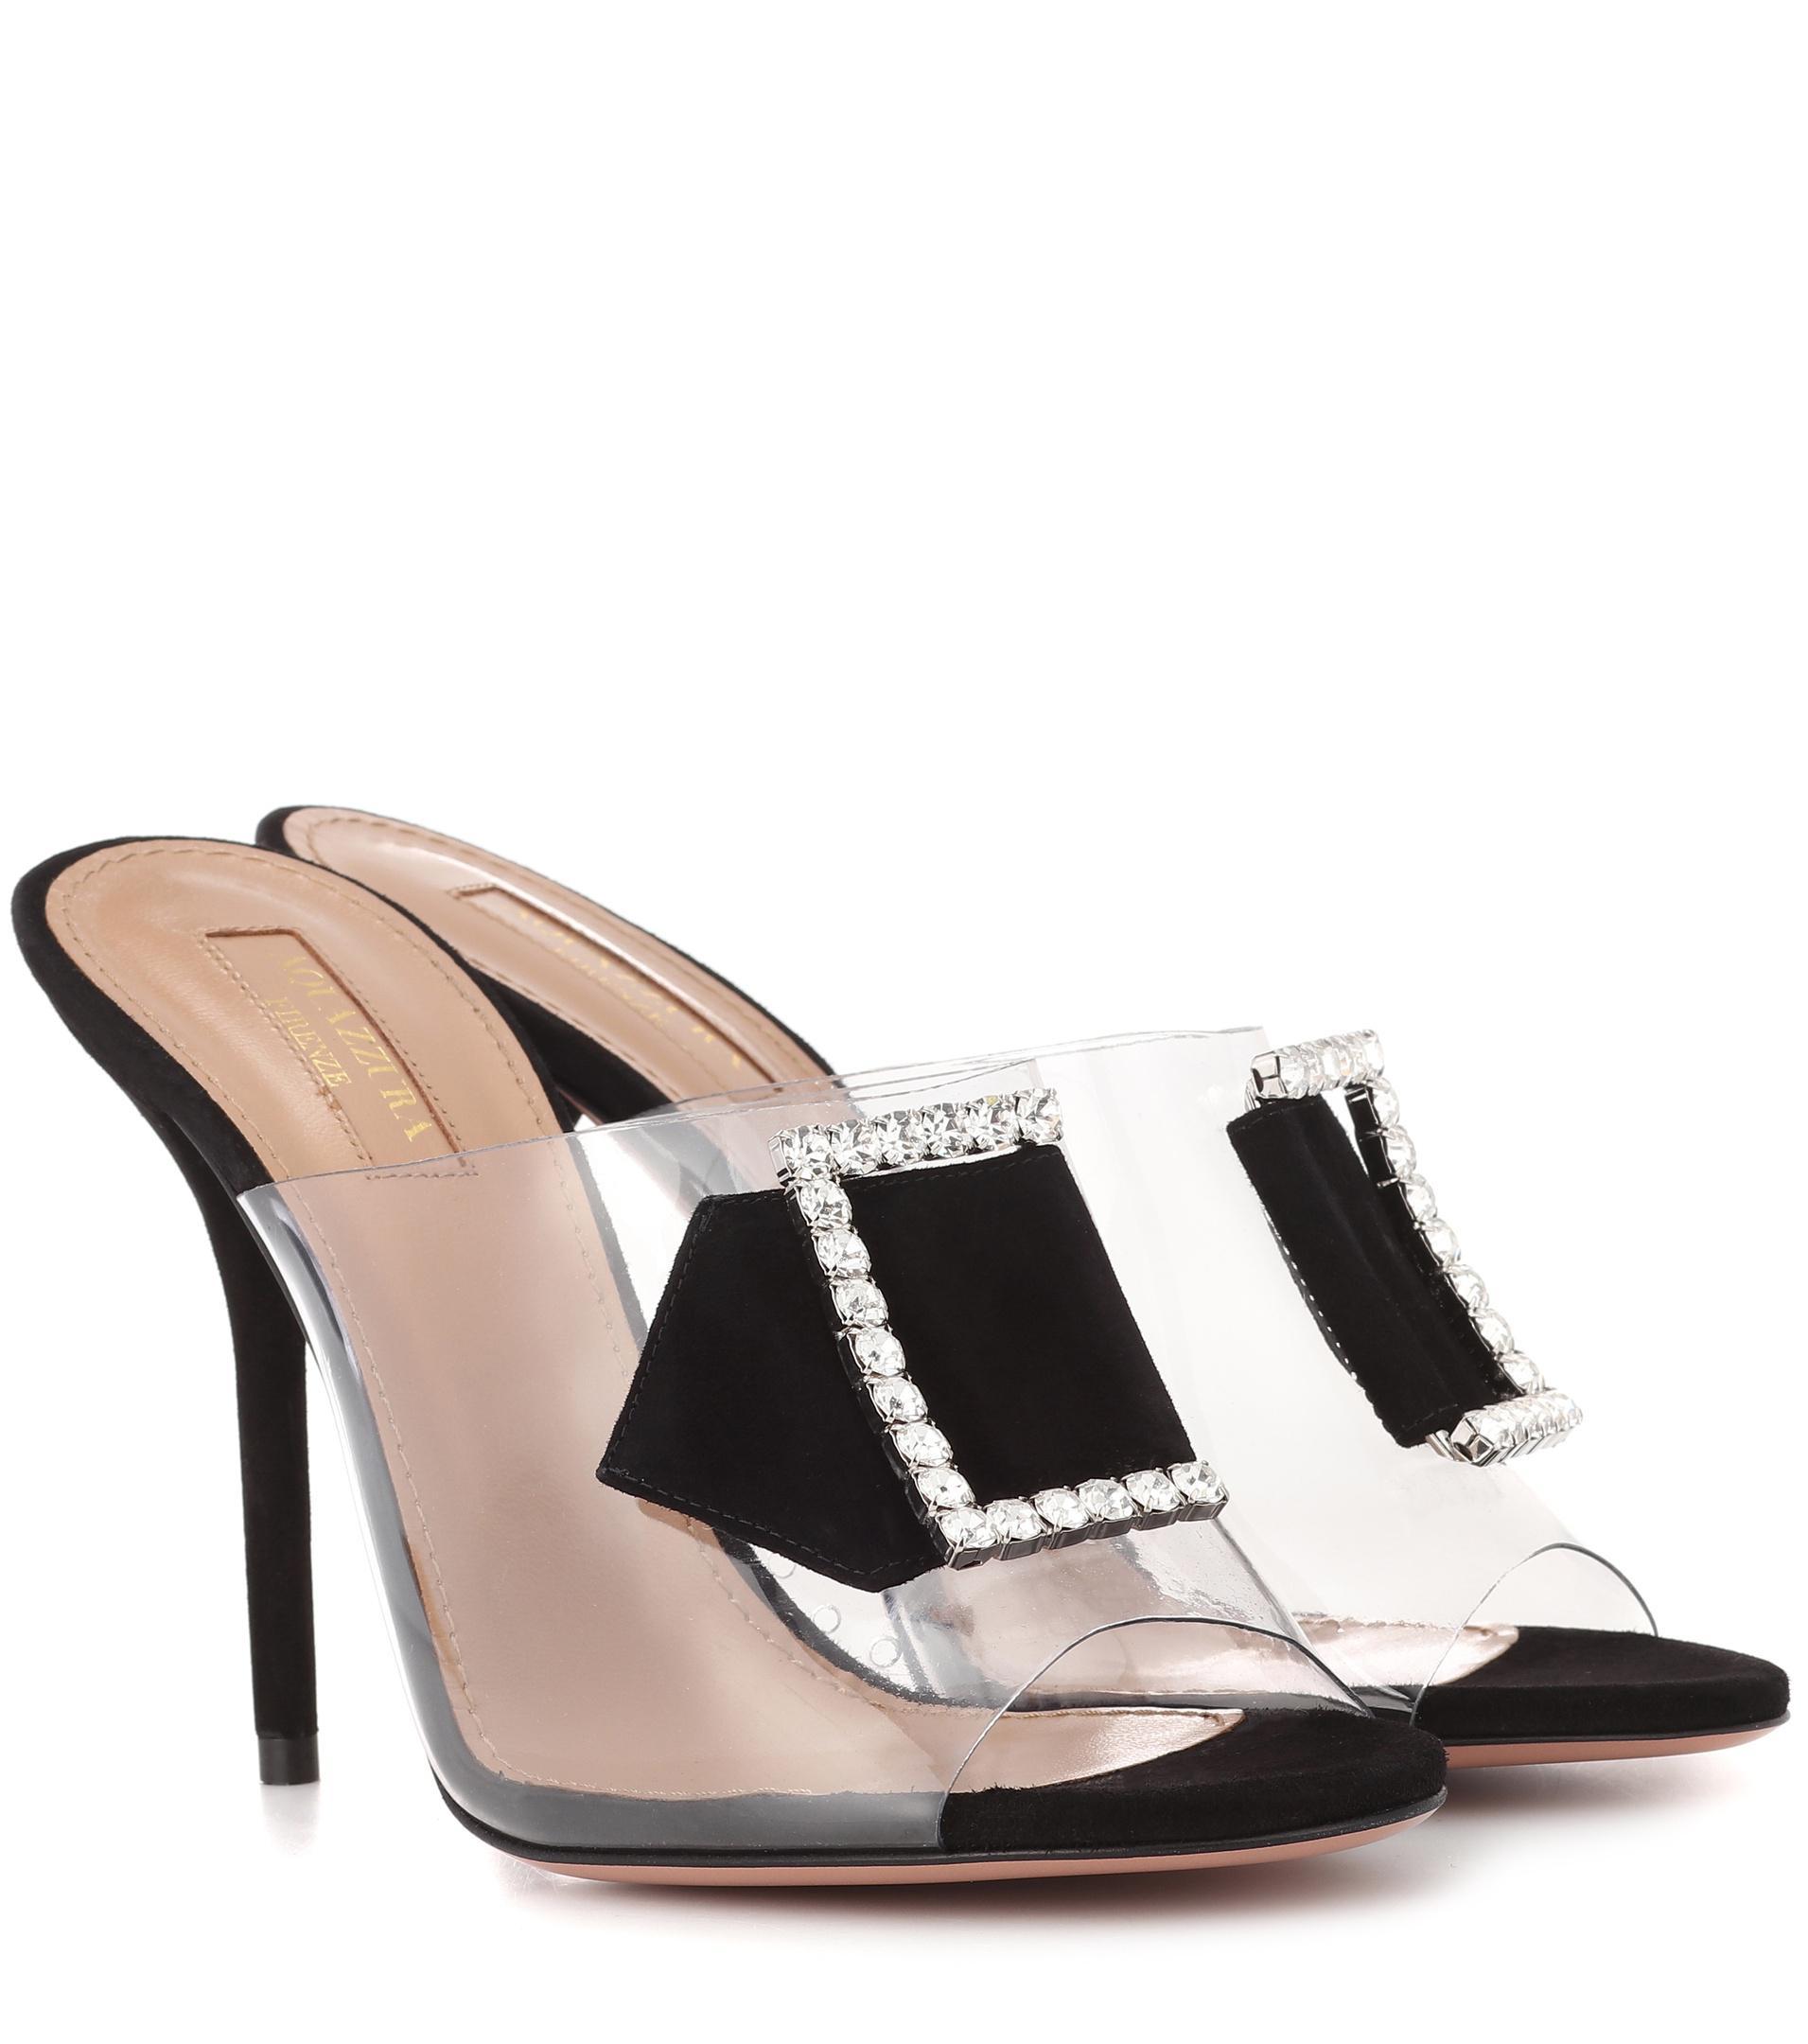 Aquazzura Sparkles 105 embellished sandals outlet the cheapest free shipping finishline 30E7t